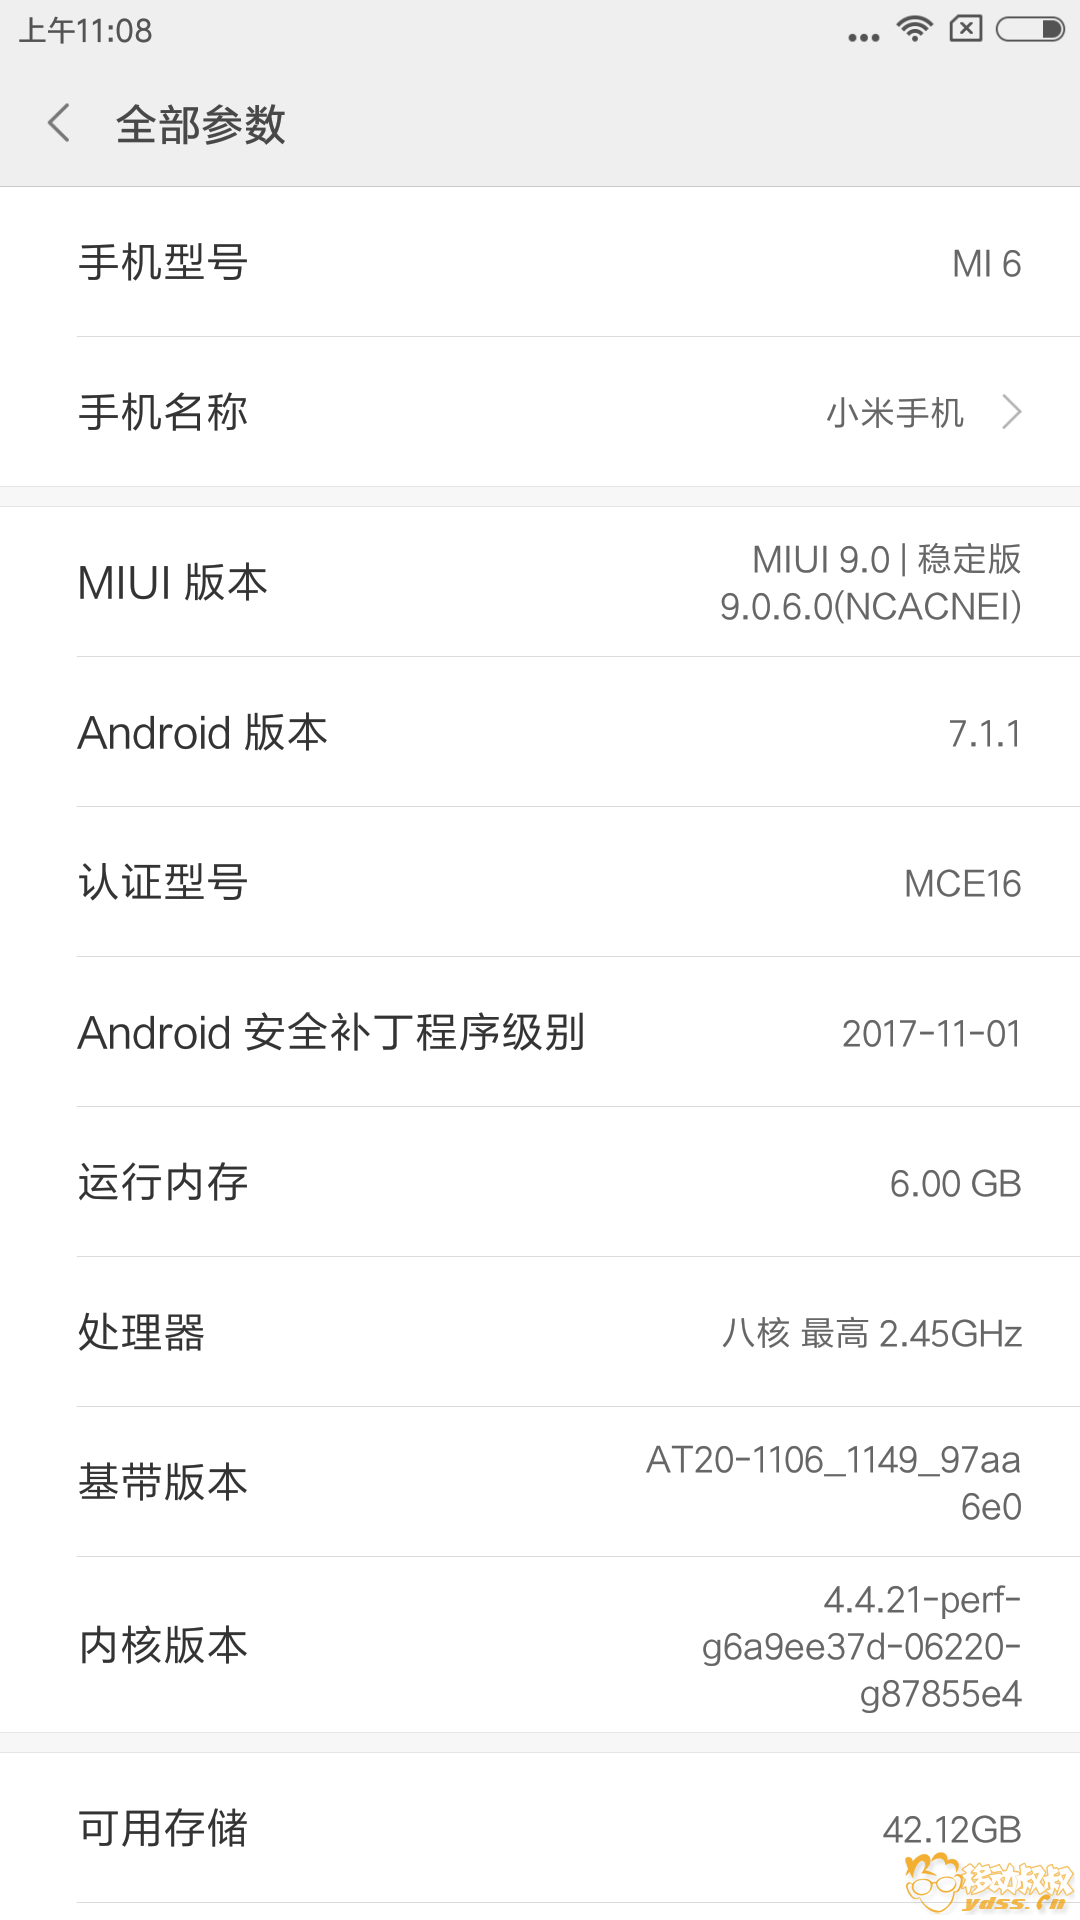 Screenshot_2017-12-24-11-08-53-439_com.android.se.png